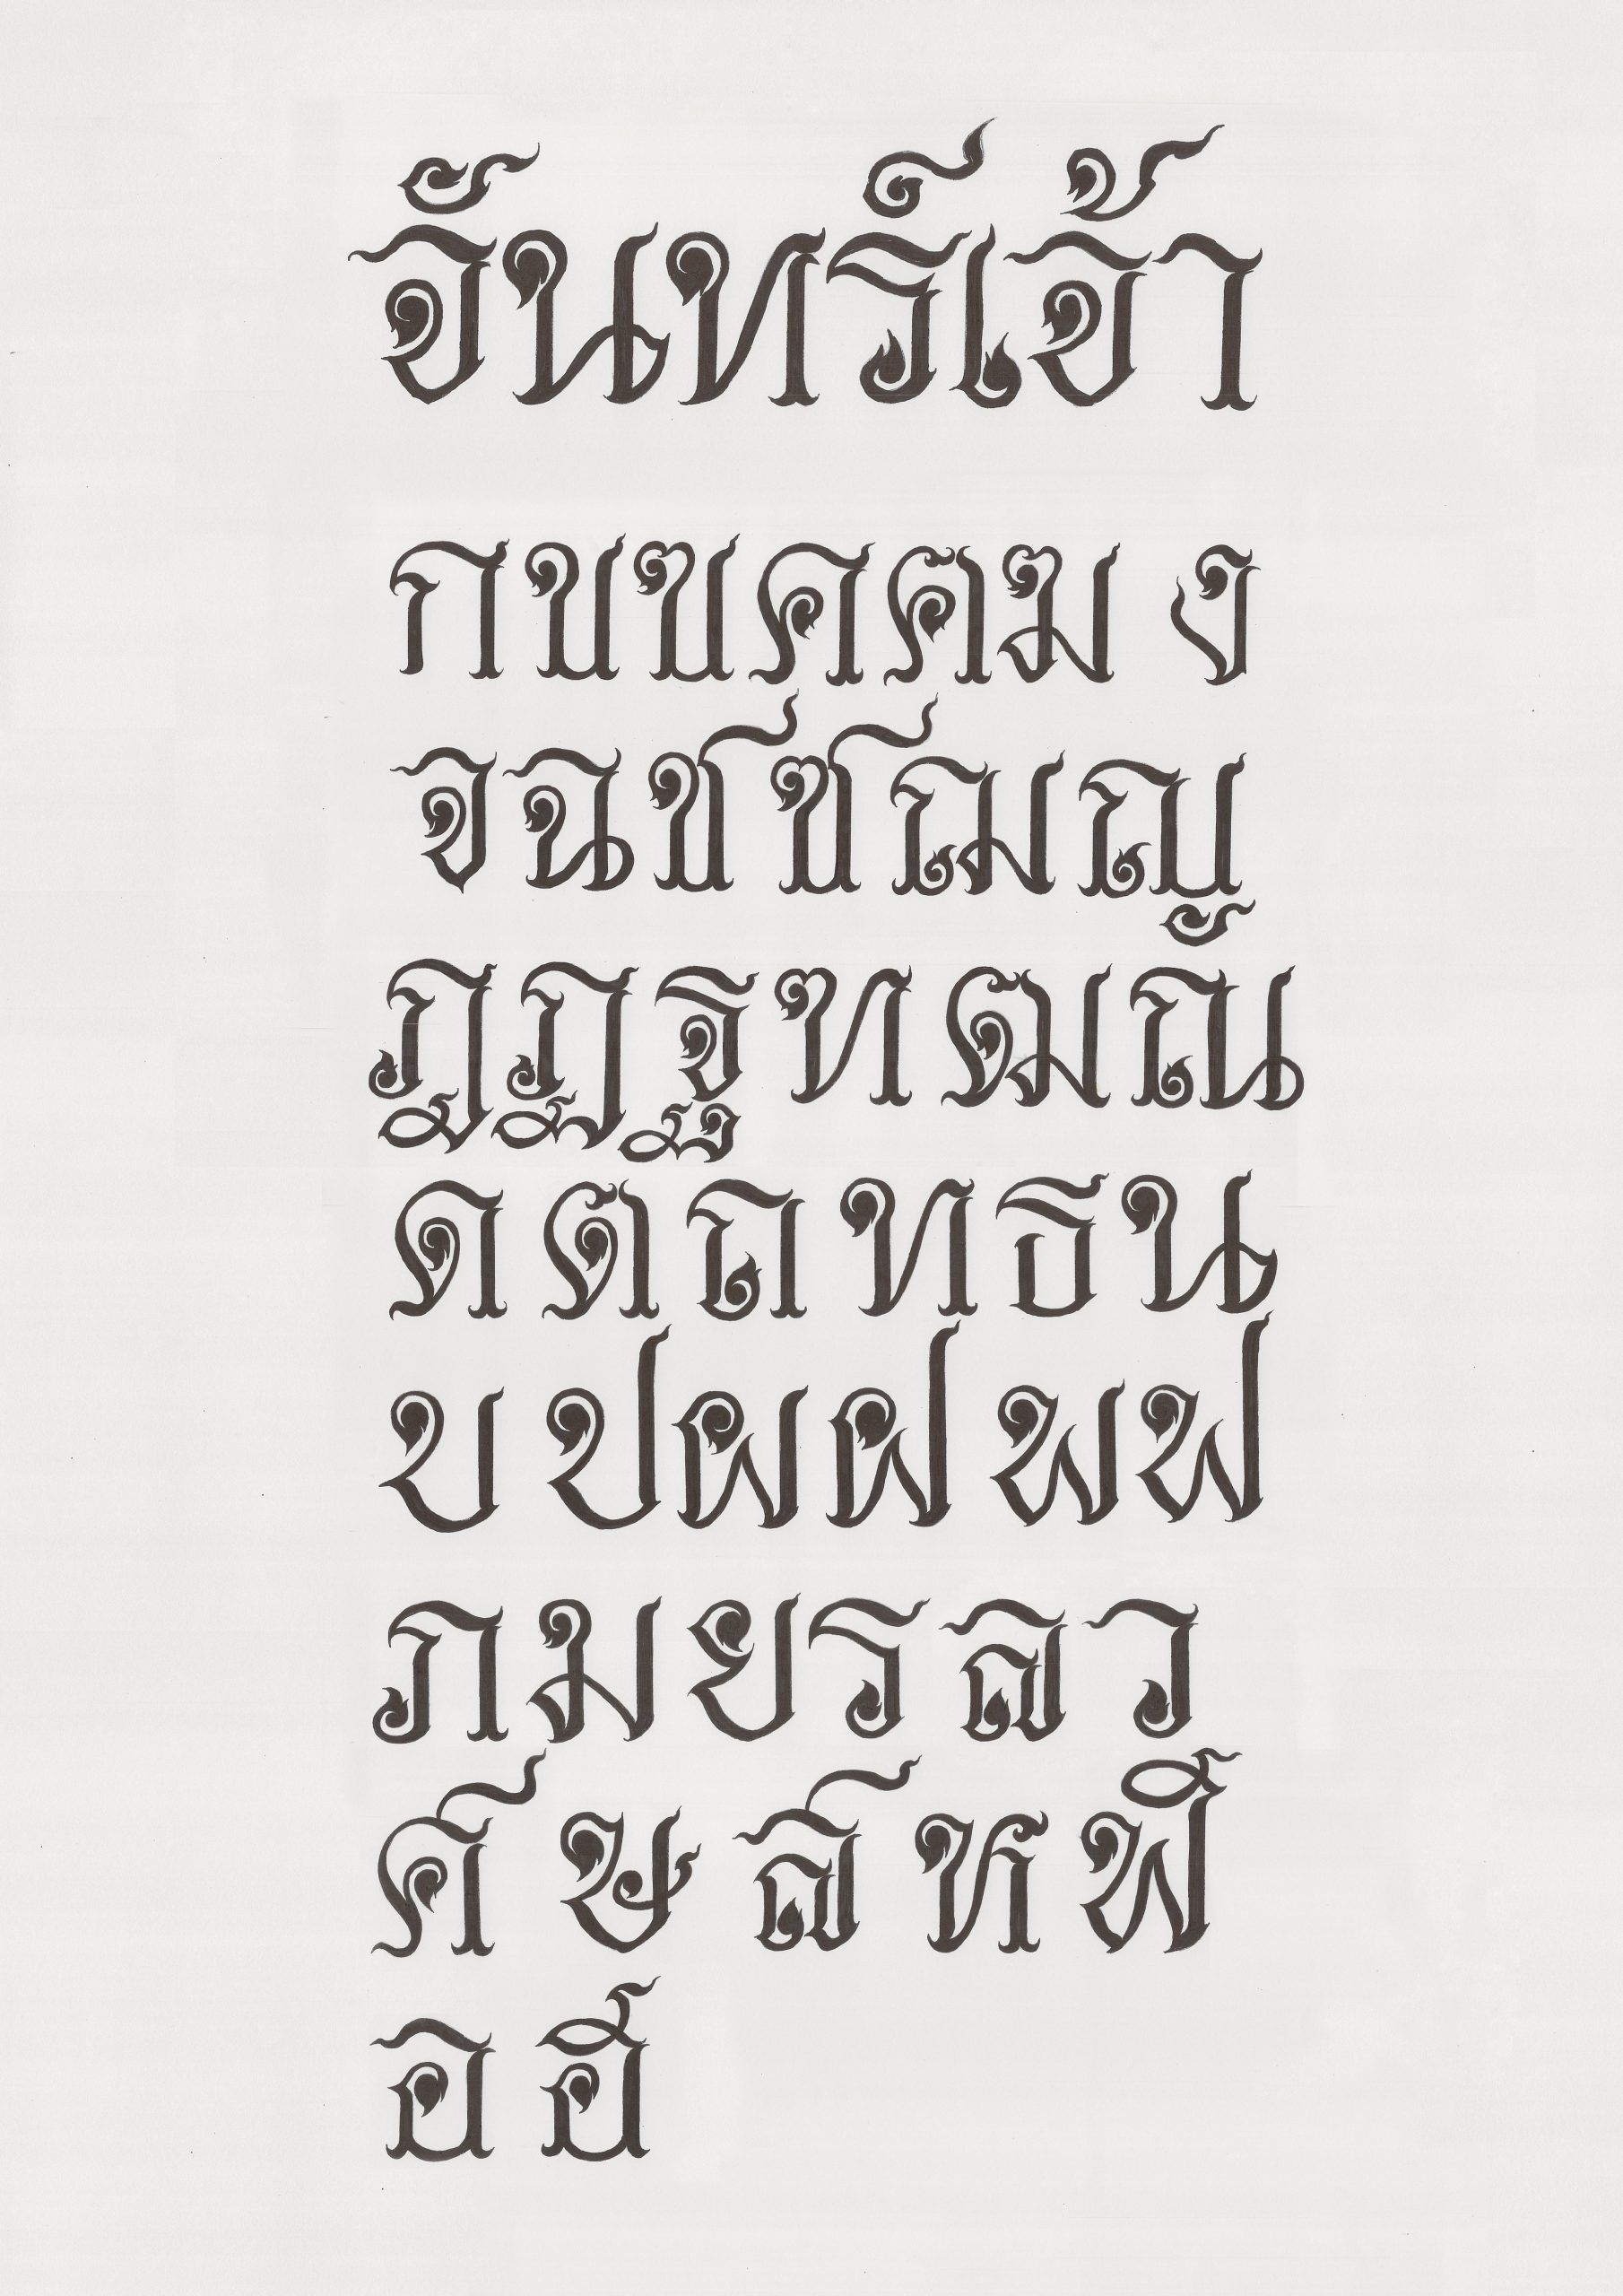 Jan Jow Thai Font By Jan Chandrvirochana Chandrvirochana Font Jan Jow Thai Chandrvirochana Font Jan Jow Thai In 2020 Thai Font Fonts Thai